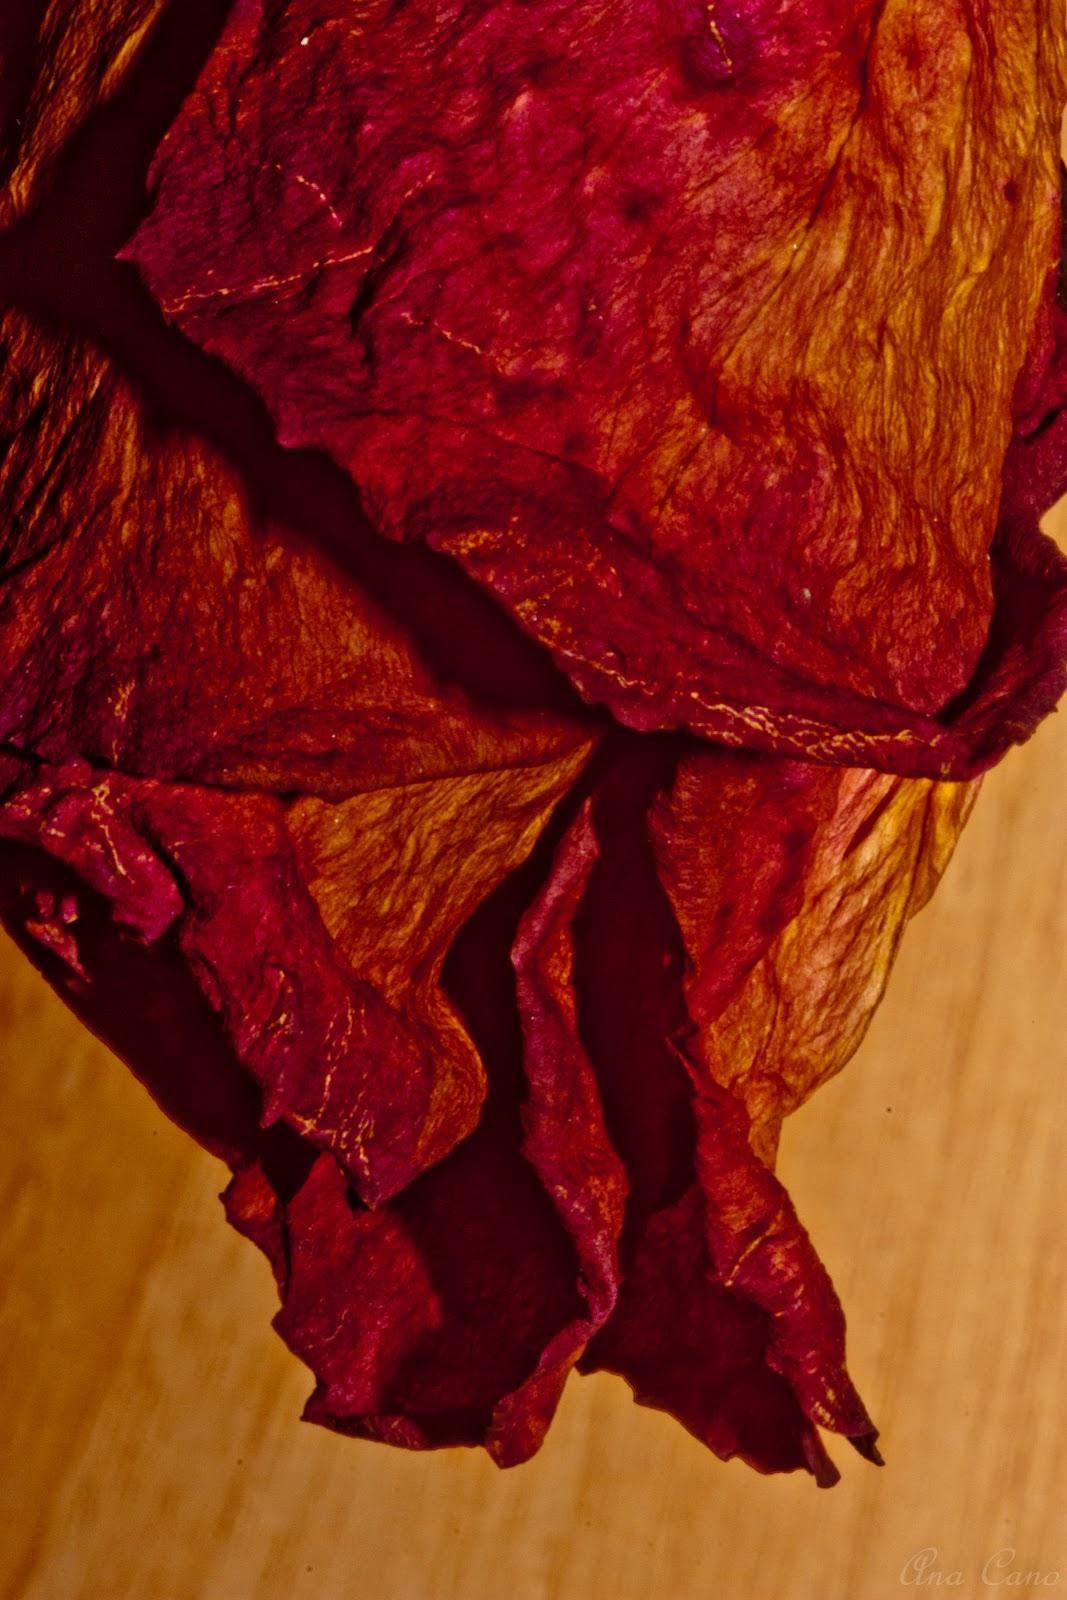 La flor marchita aun tiene perfume - 1 part 8